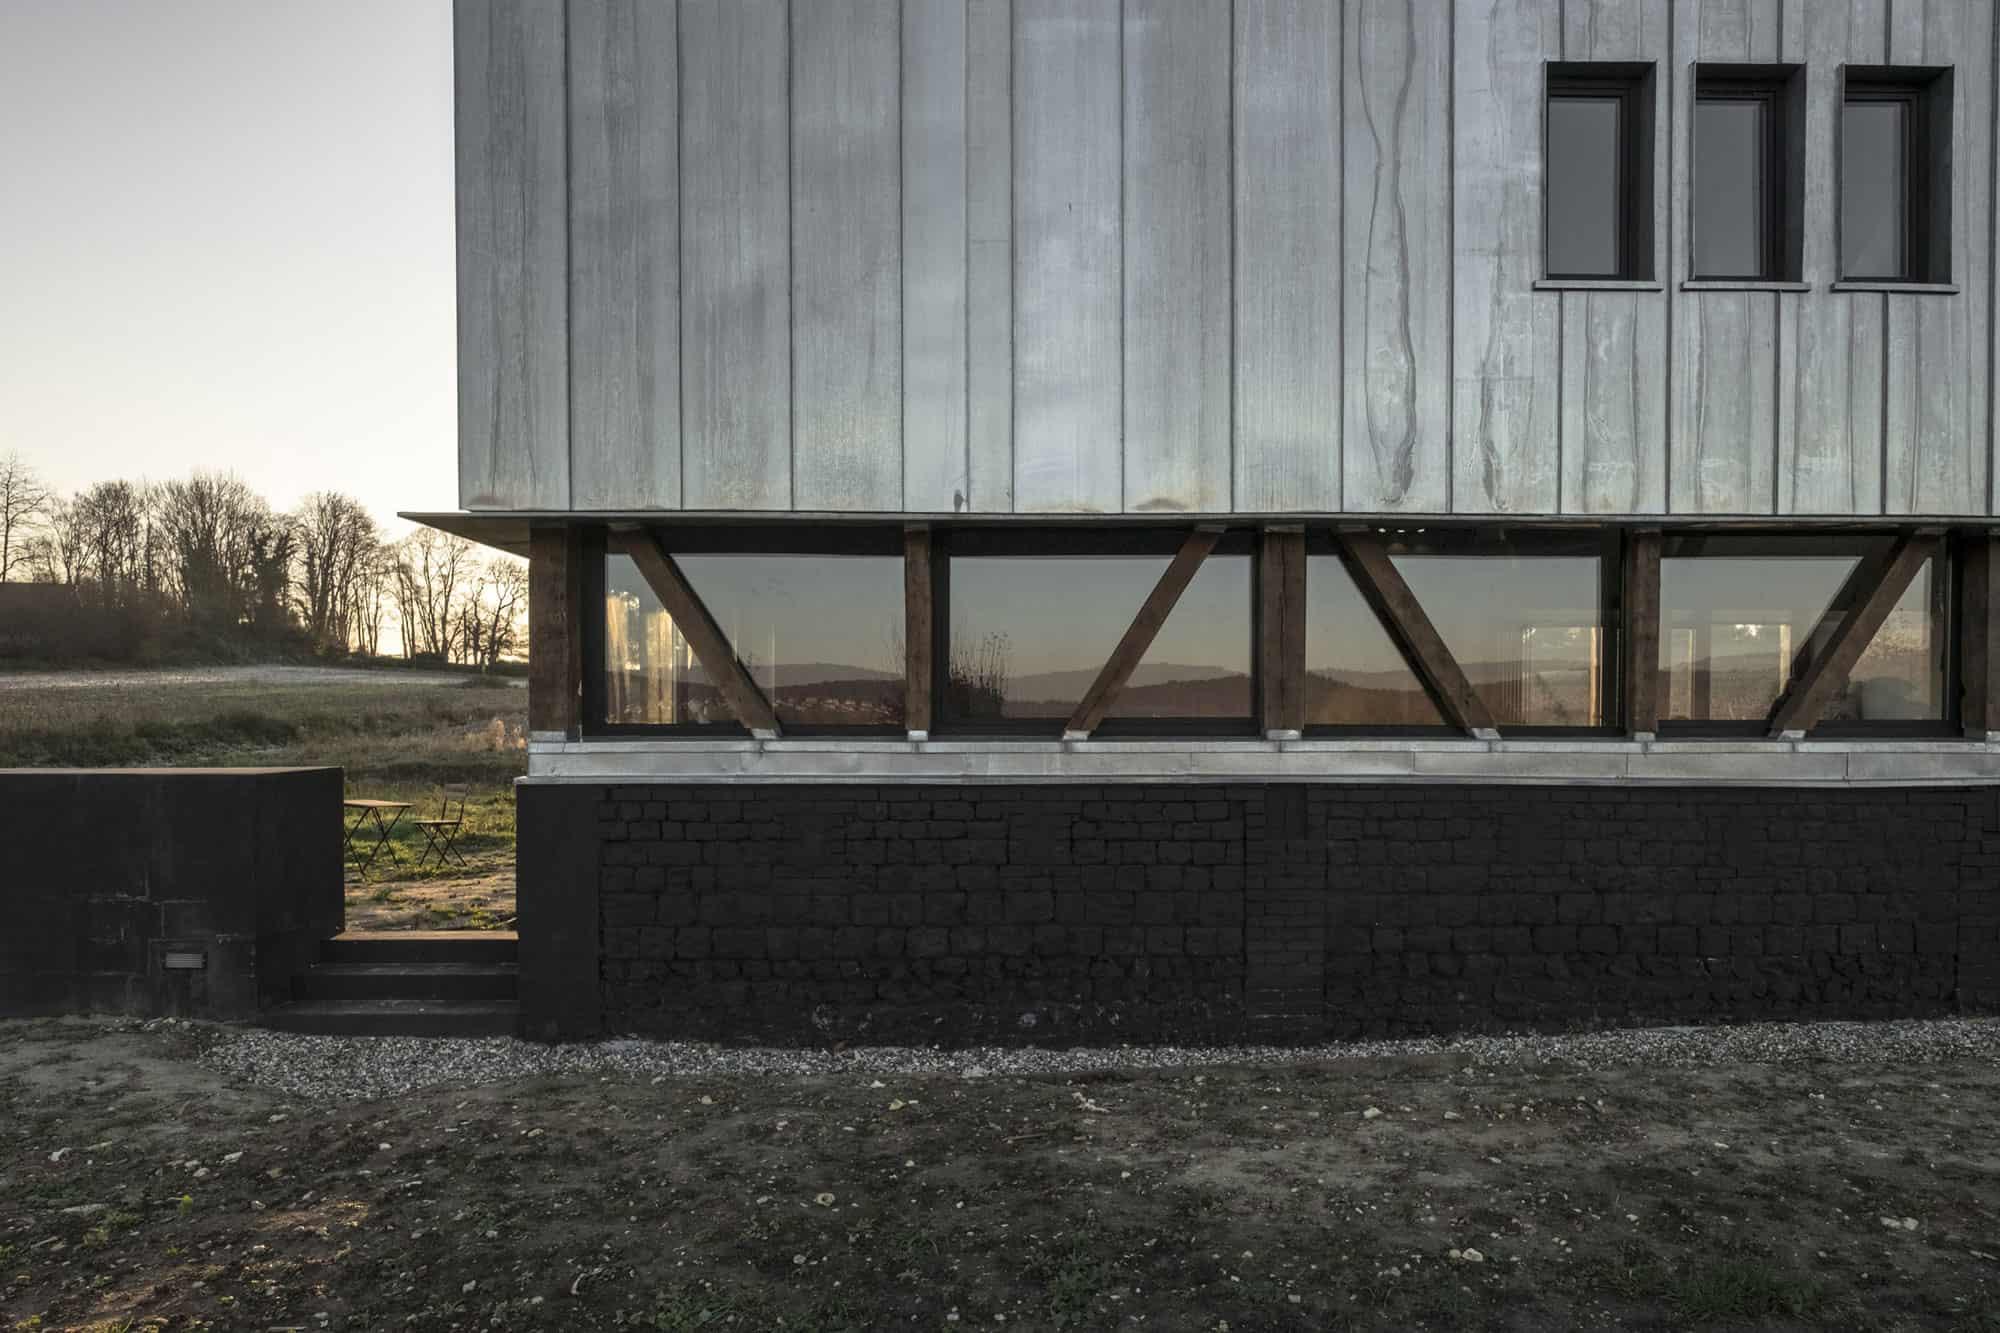 Antonin-Ziegler-covers-abandoned-barn-in-zinc-plates-03